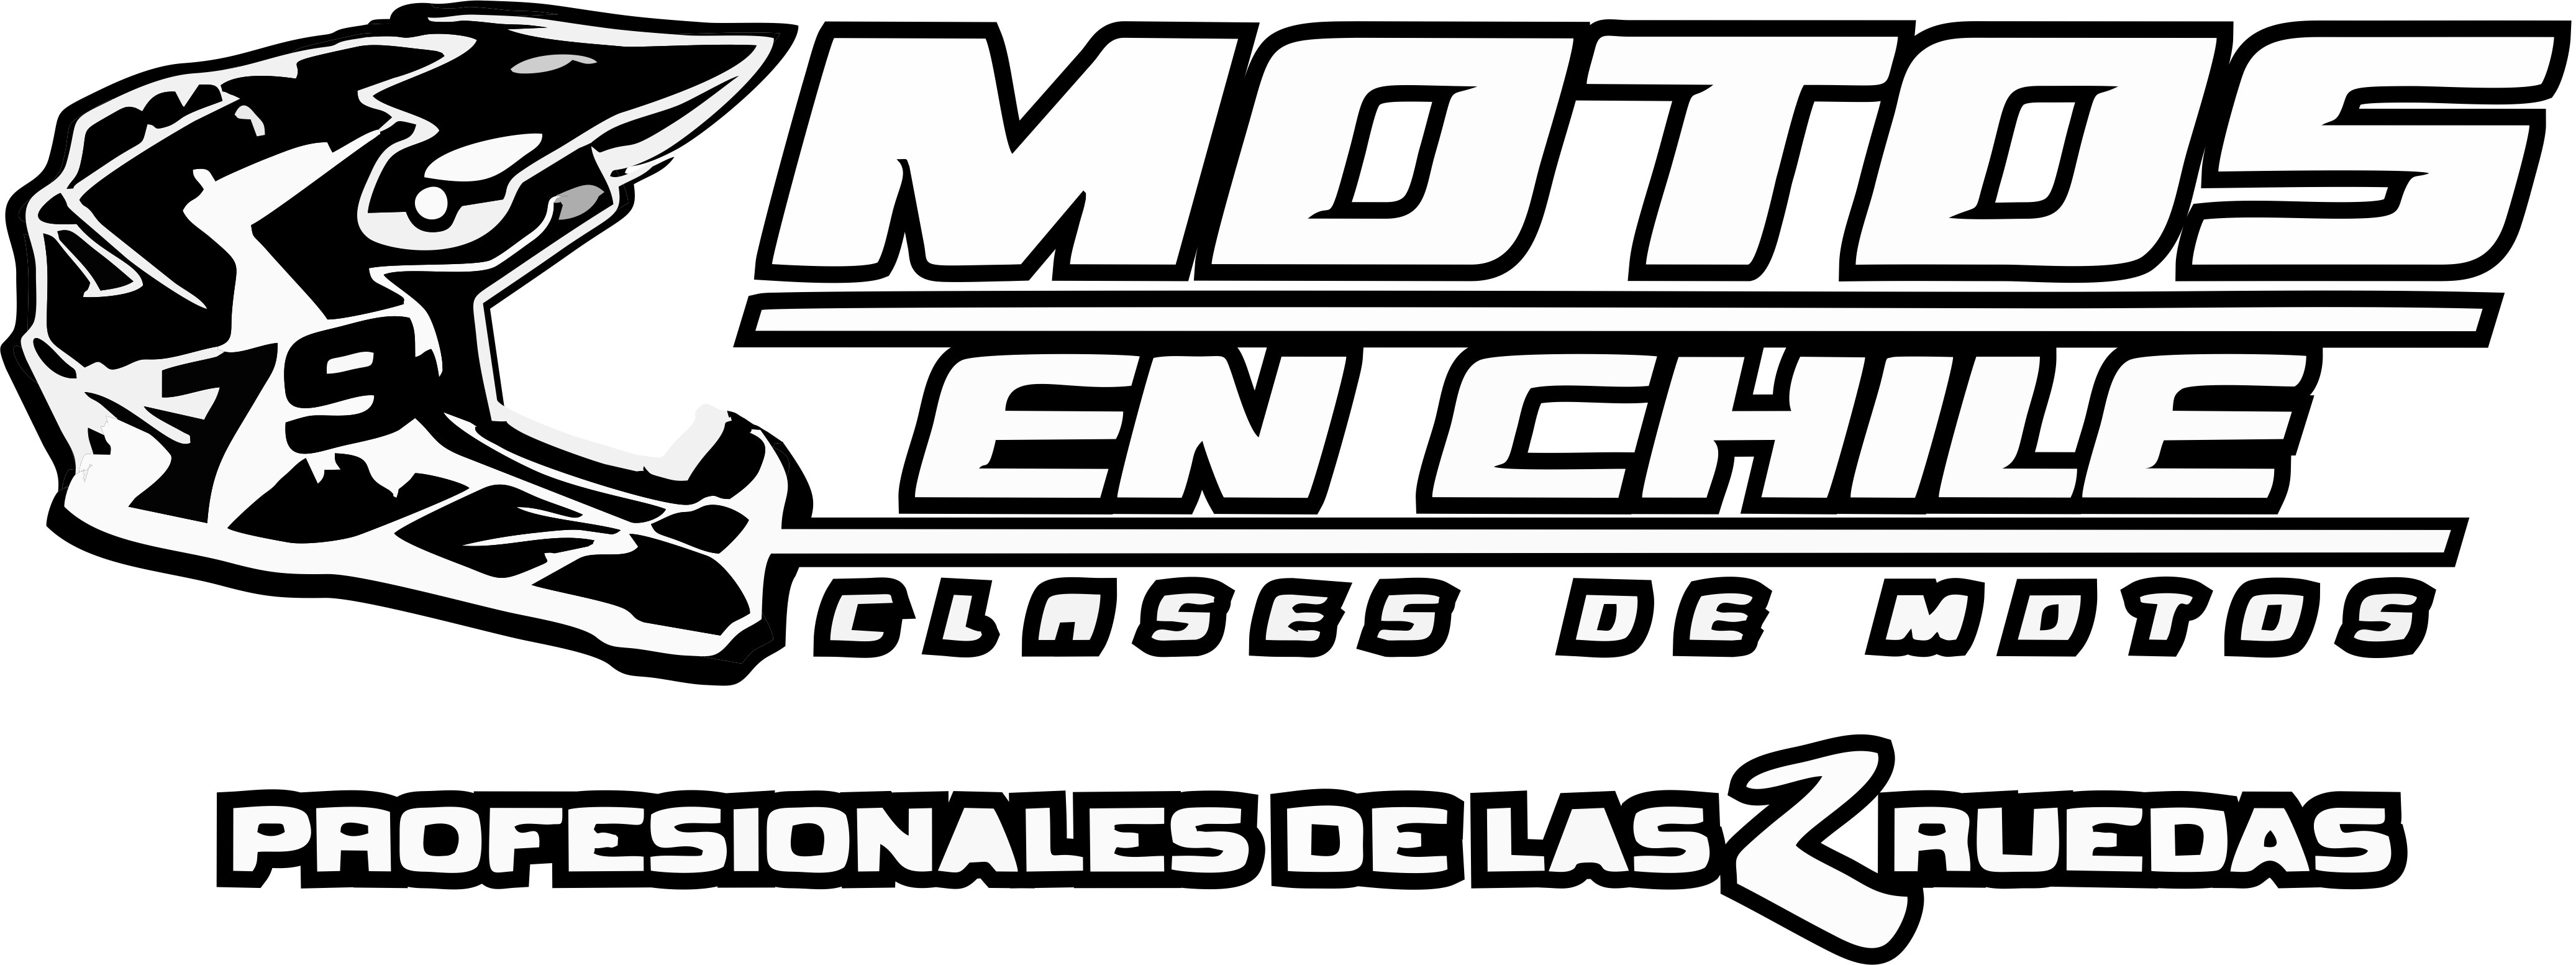 Motos en Chile